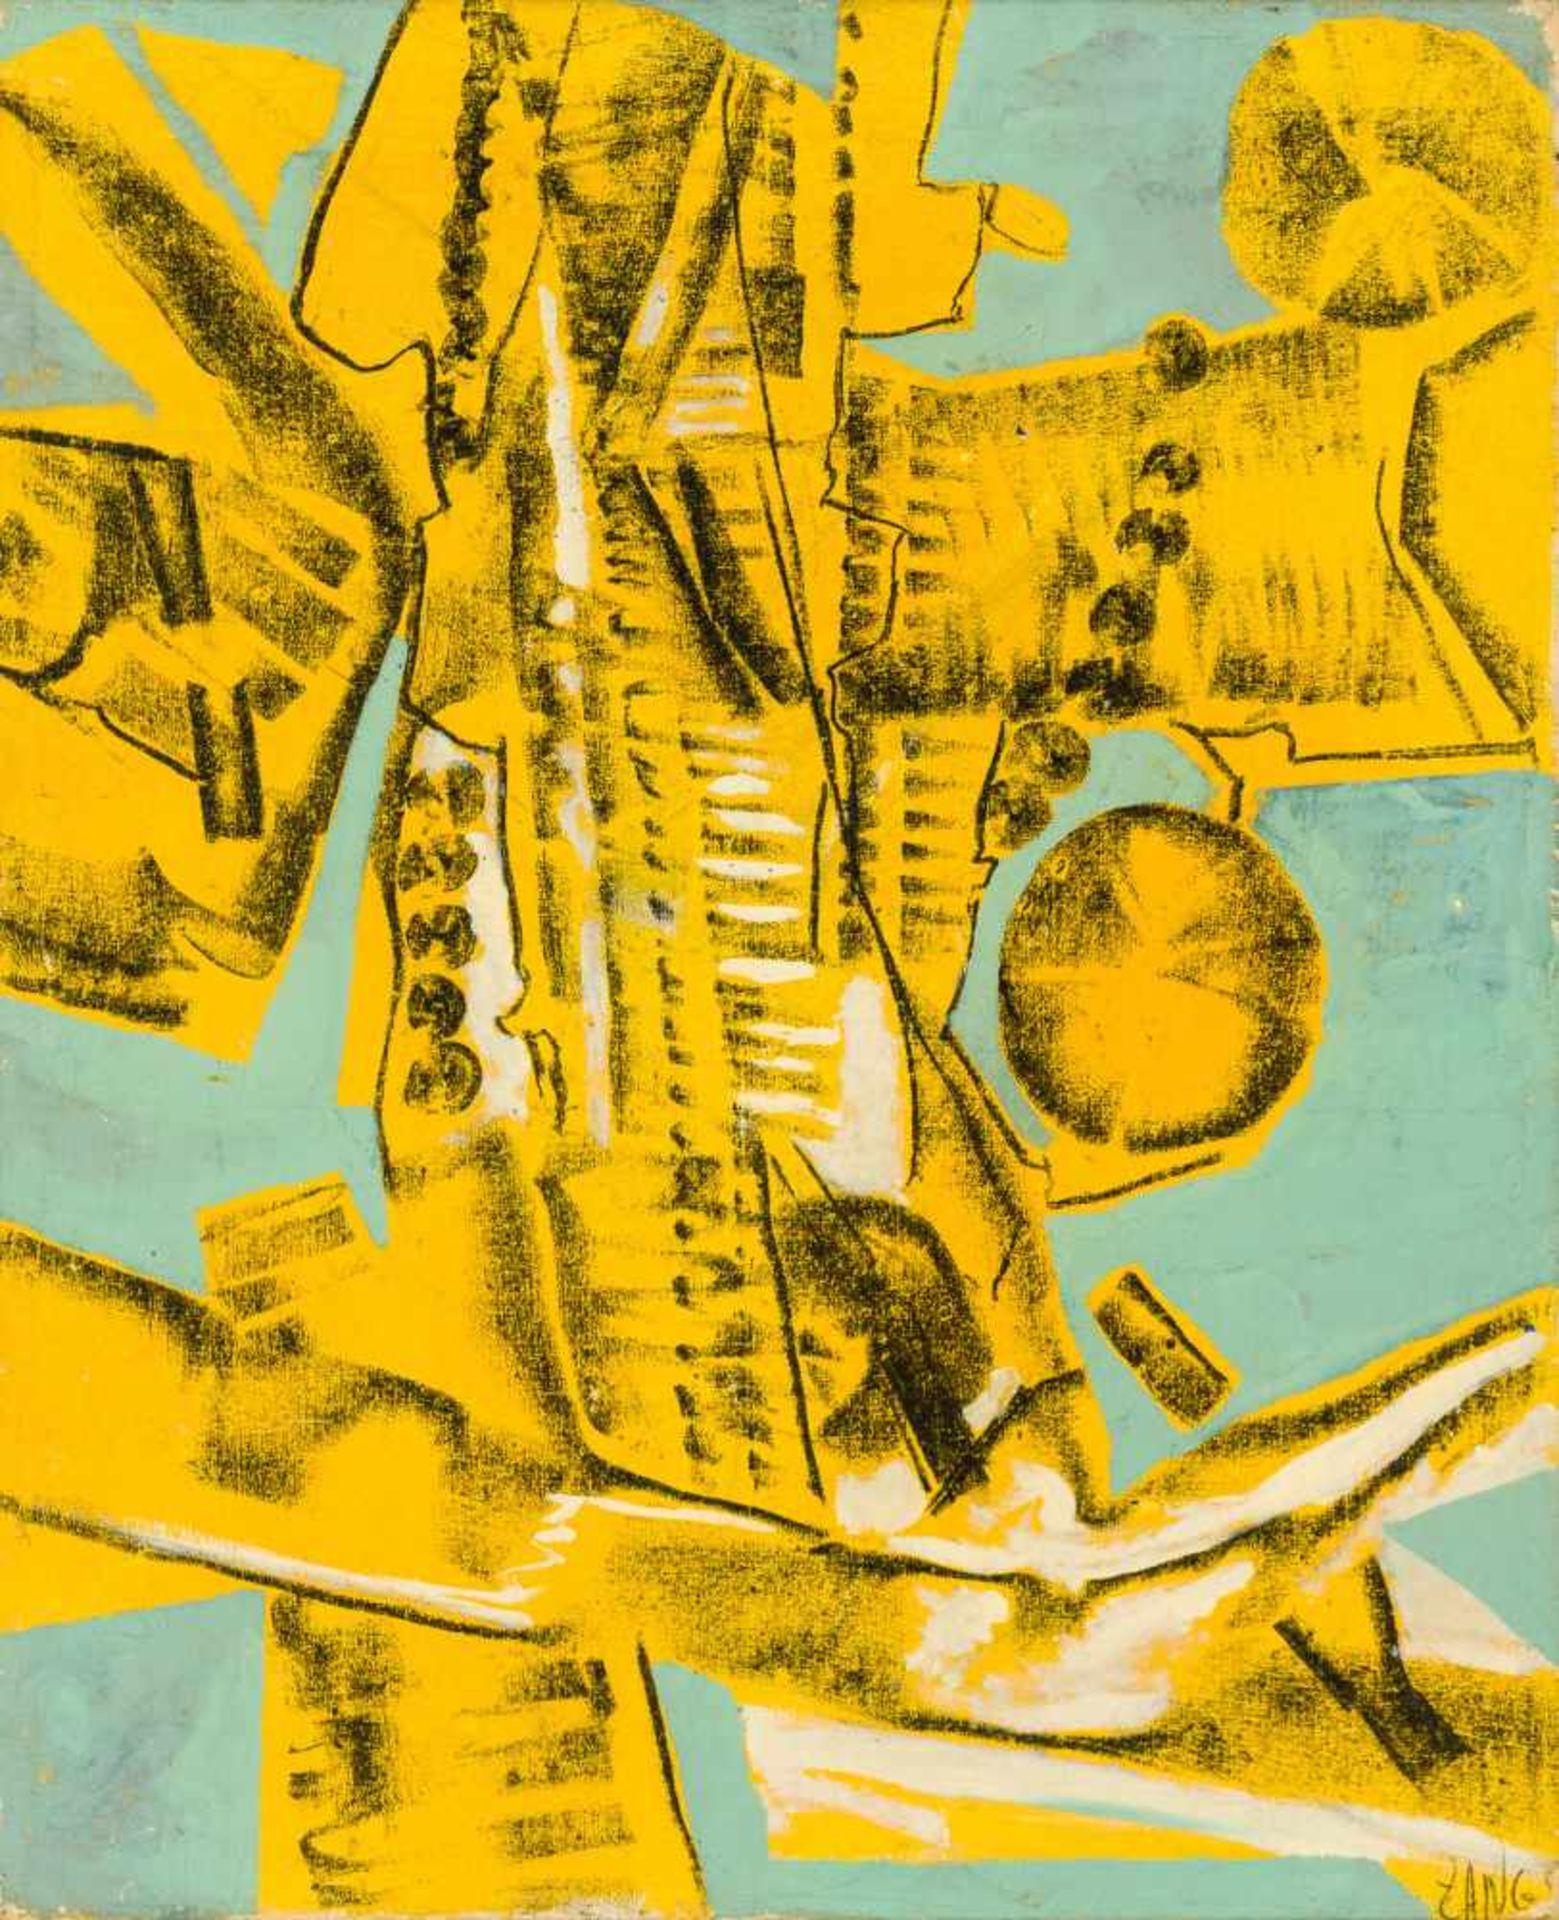 Los 5 - Herbert Zangs Krefeld 1924 - 2003 Krefeld Yellow Wheelwalks Öl auf Leinwand 84 x 68 cm rechts